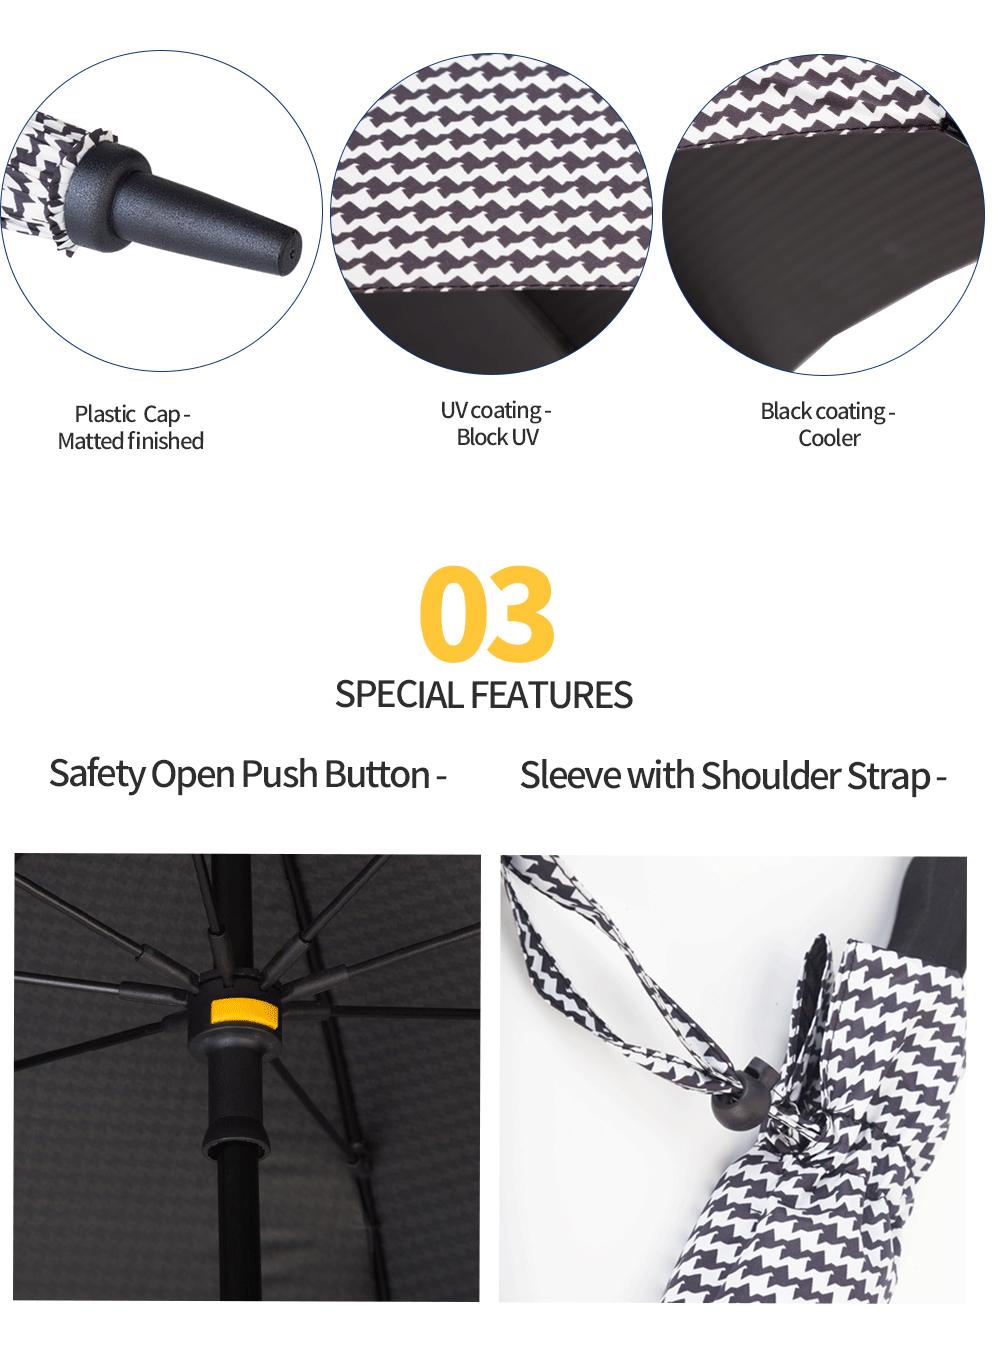 Product-Descrption-page---Ultra-Light-Golf-Umbrella_09